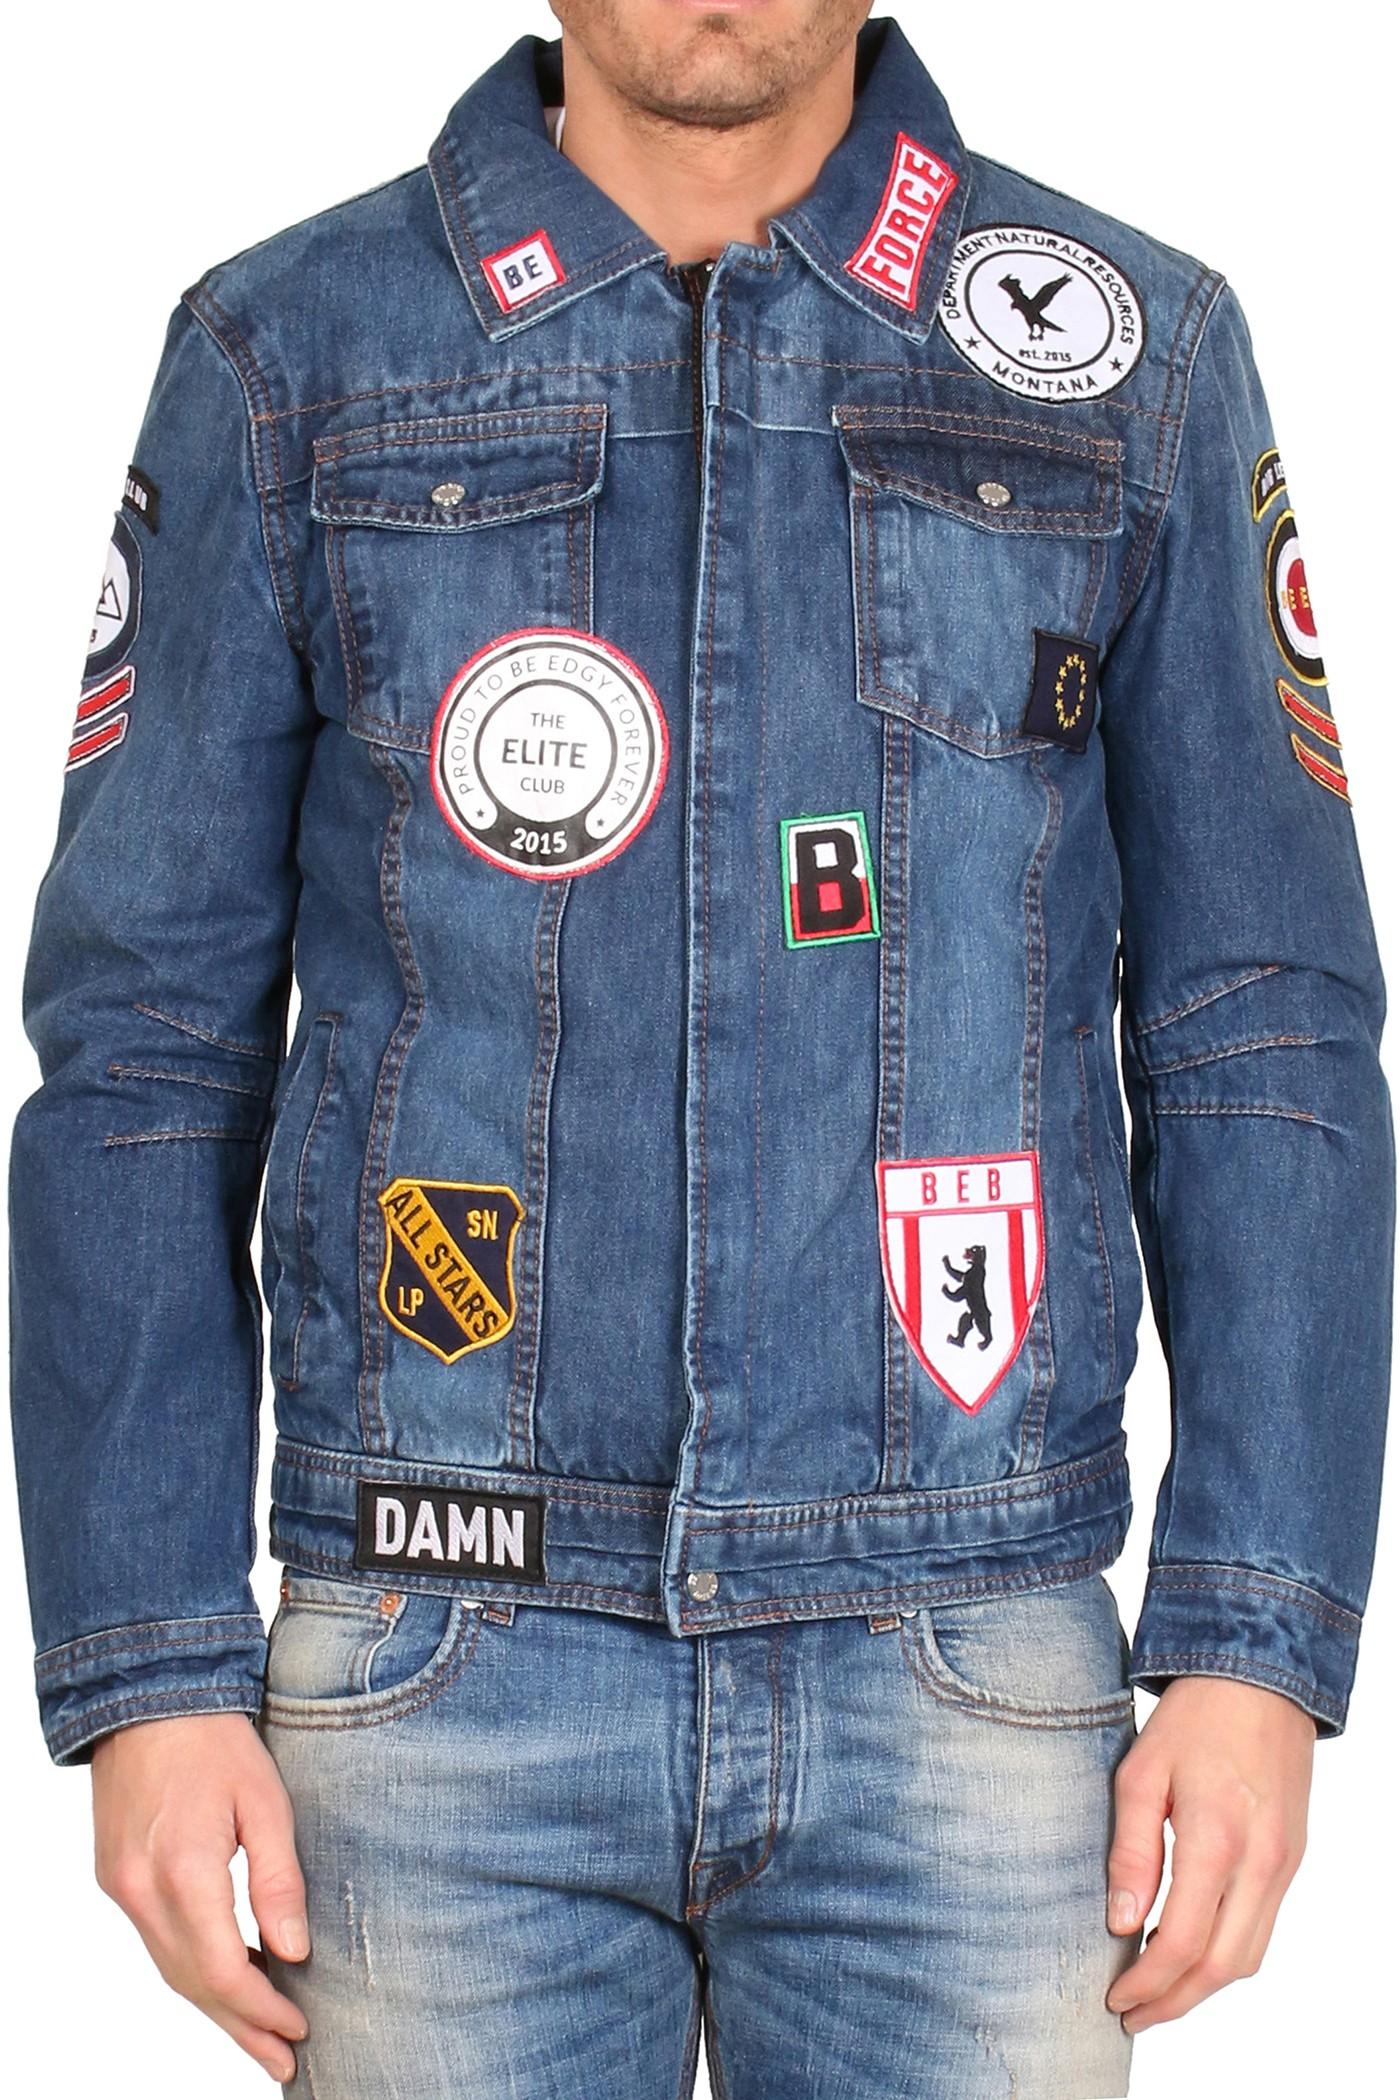 Afbeelding van Be Edgy Berave patch jacket - denim